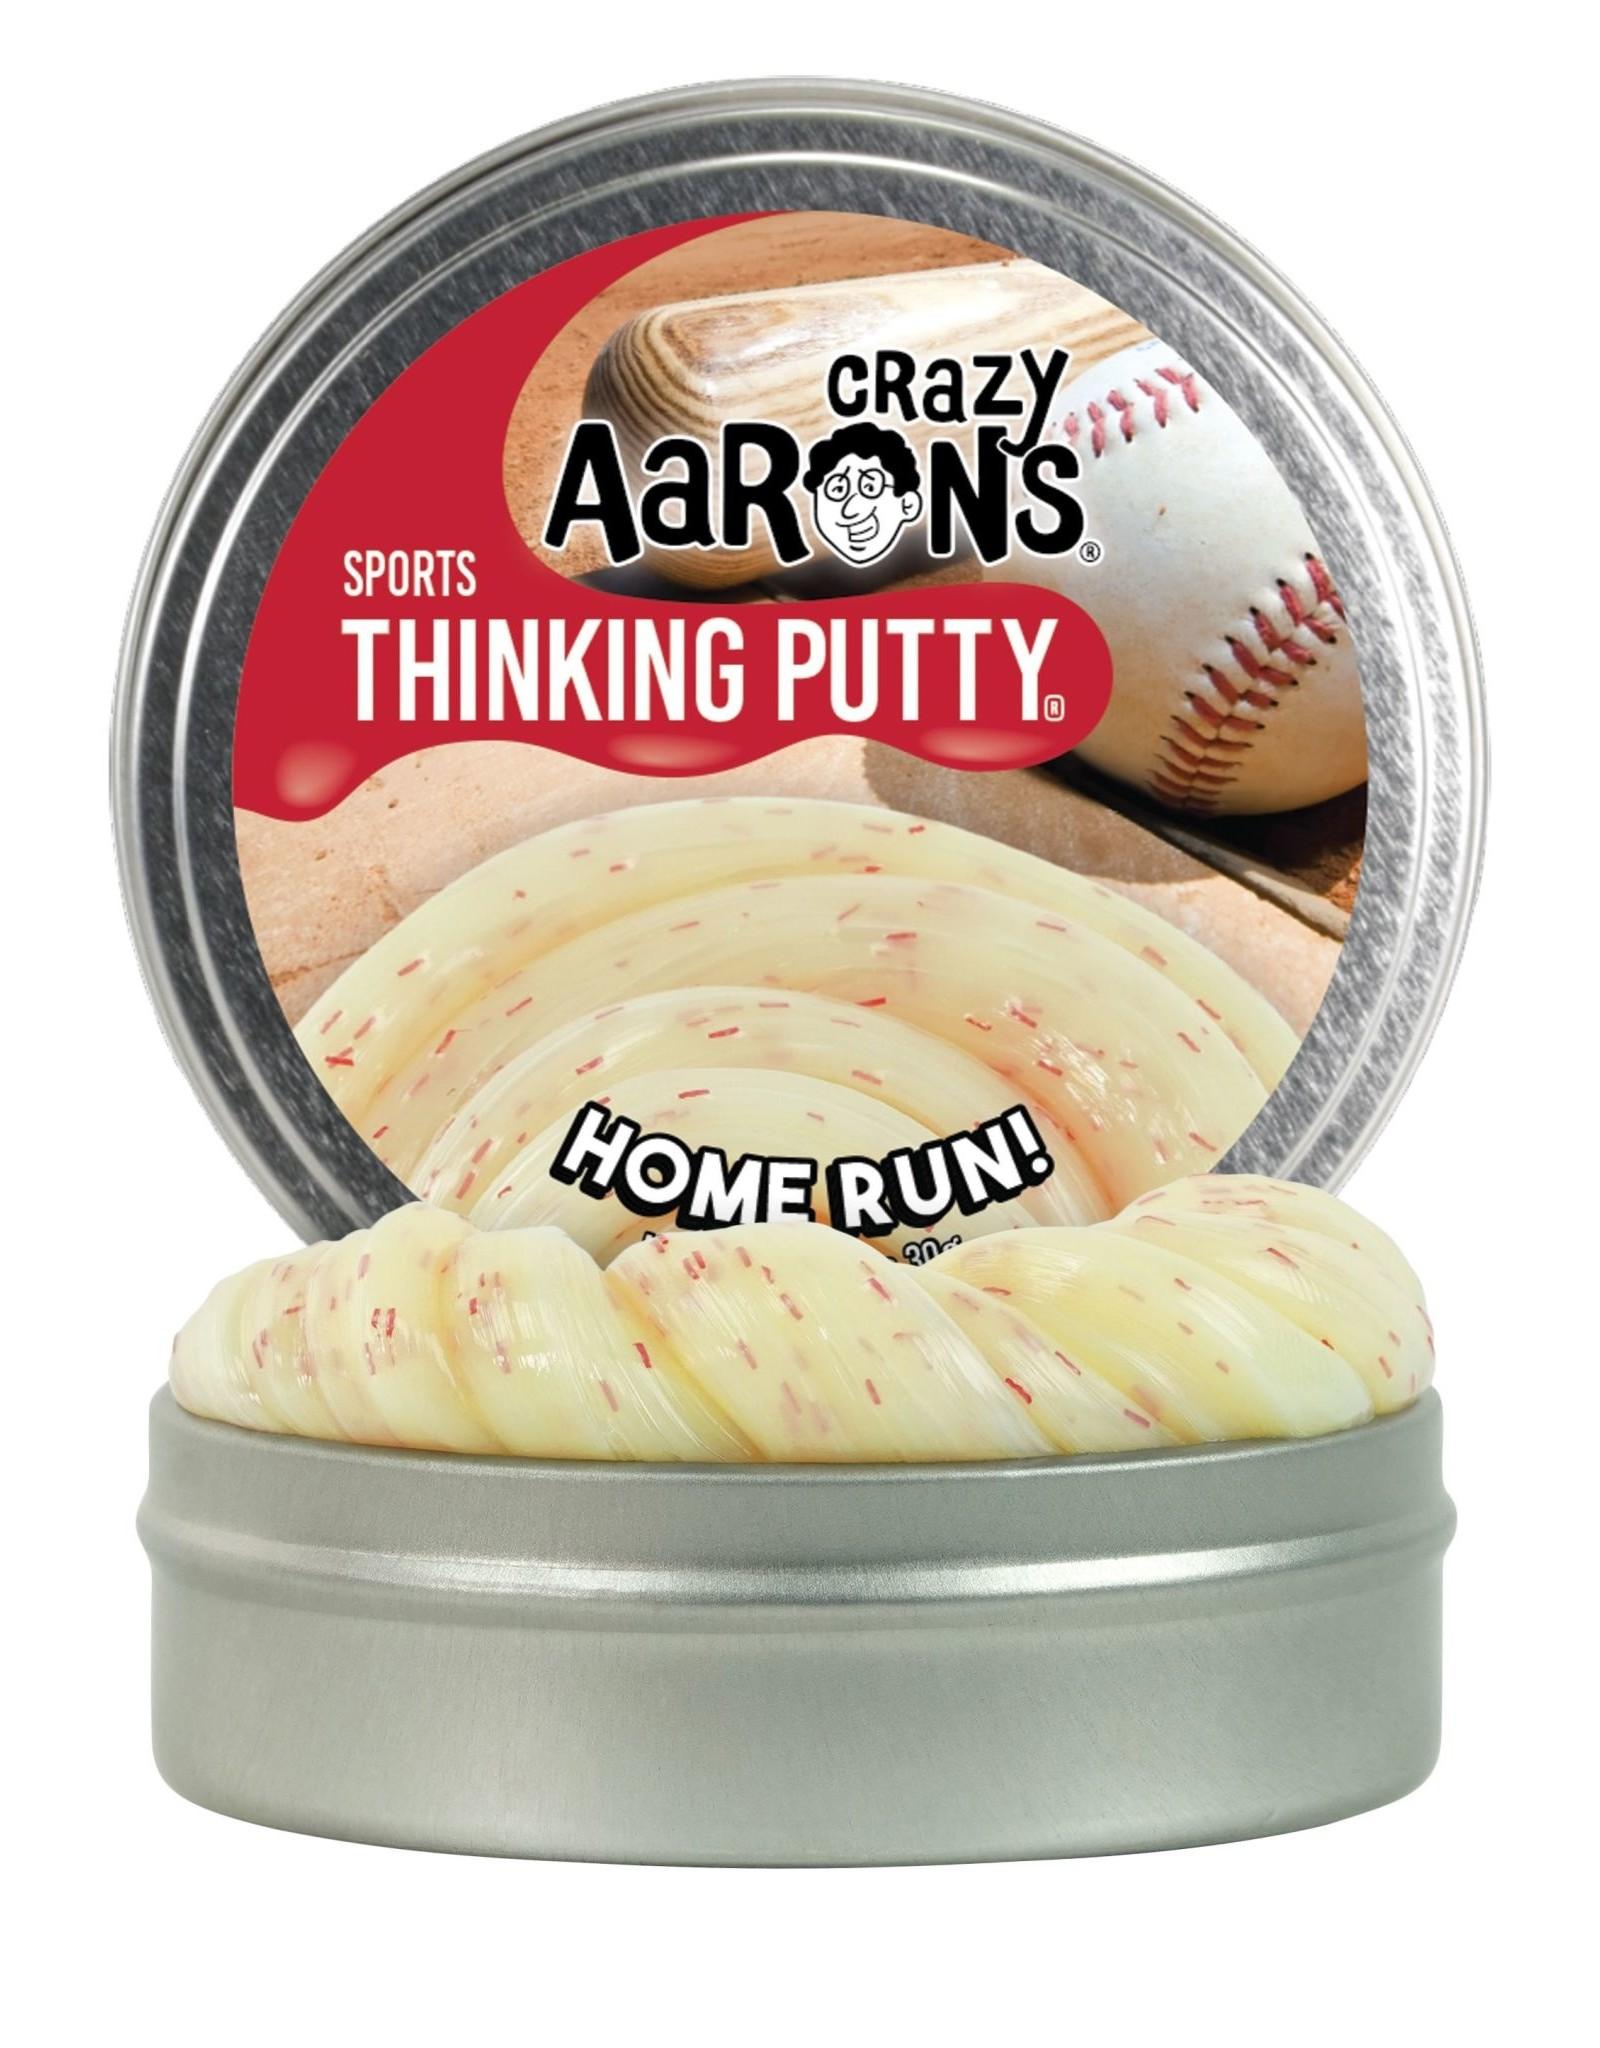 Crazy Aarons Sports Putty - BASEBALL CORNHOLE